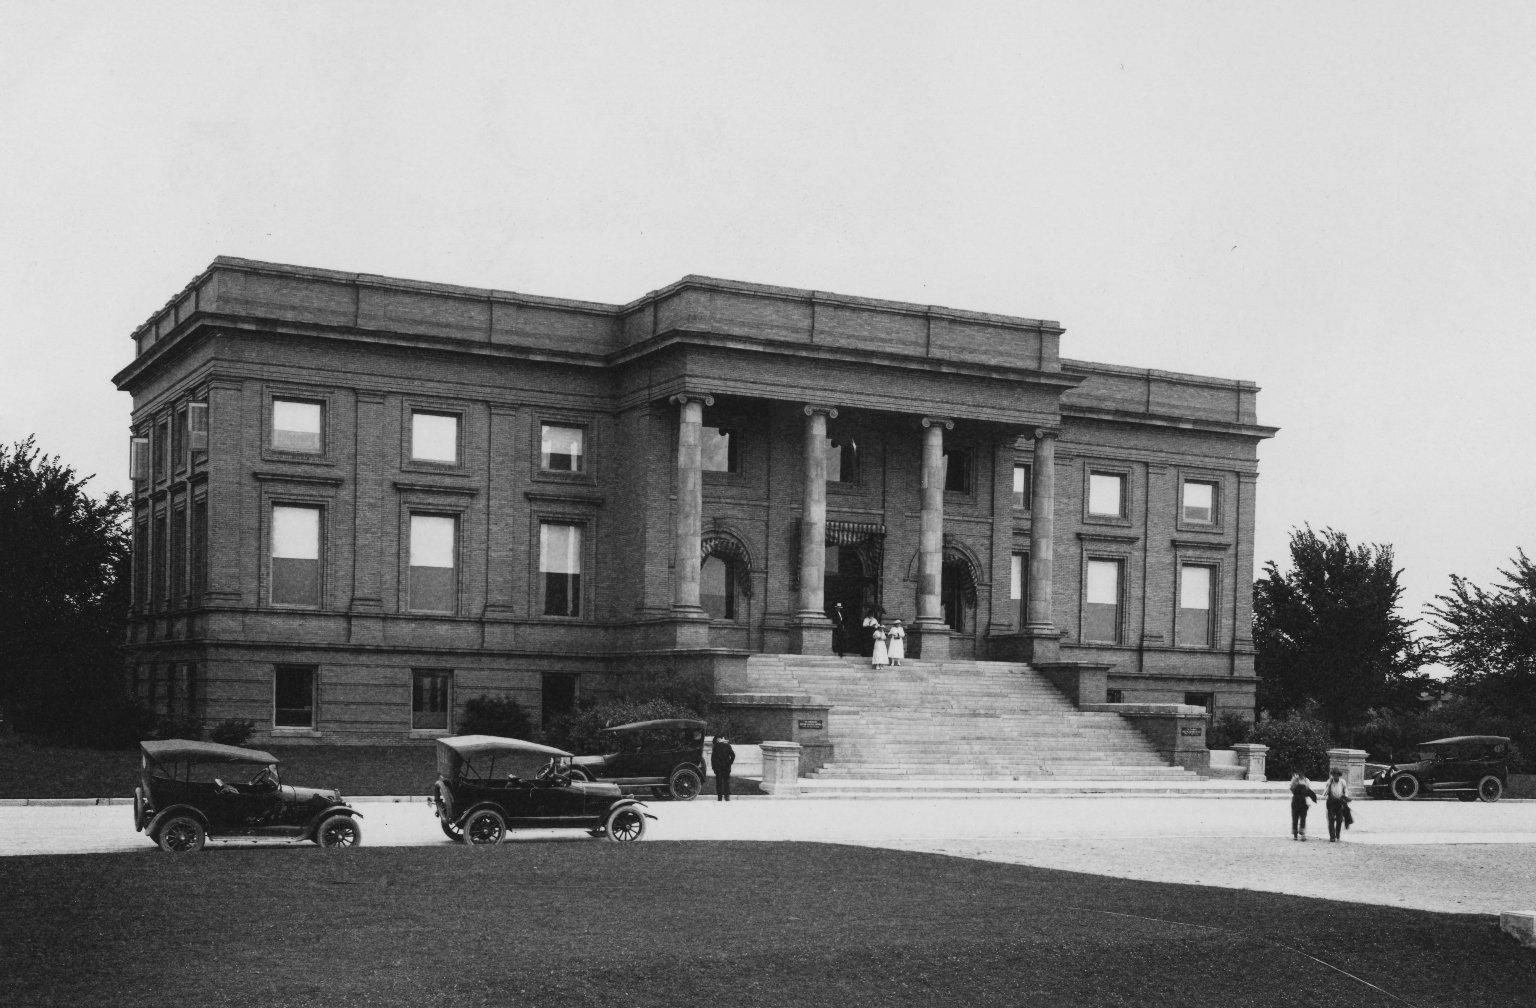 Denver Museum of Natural History building, 1908.